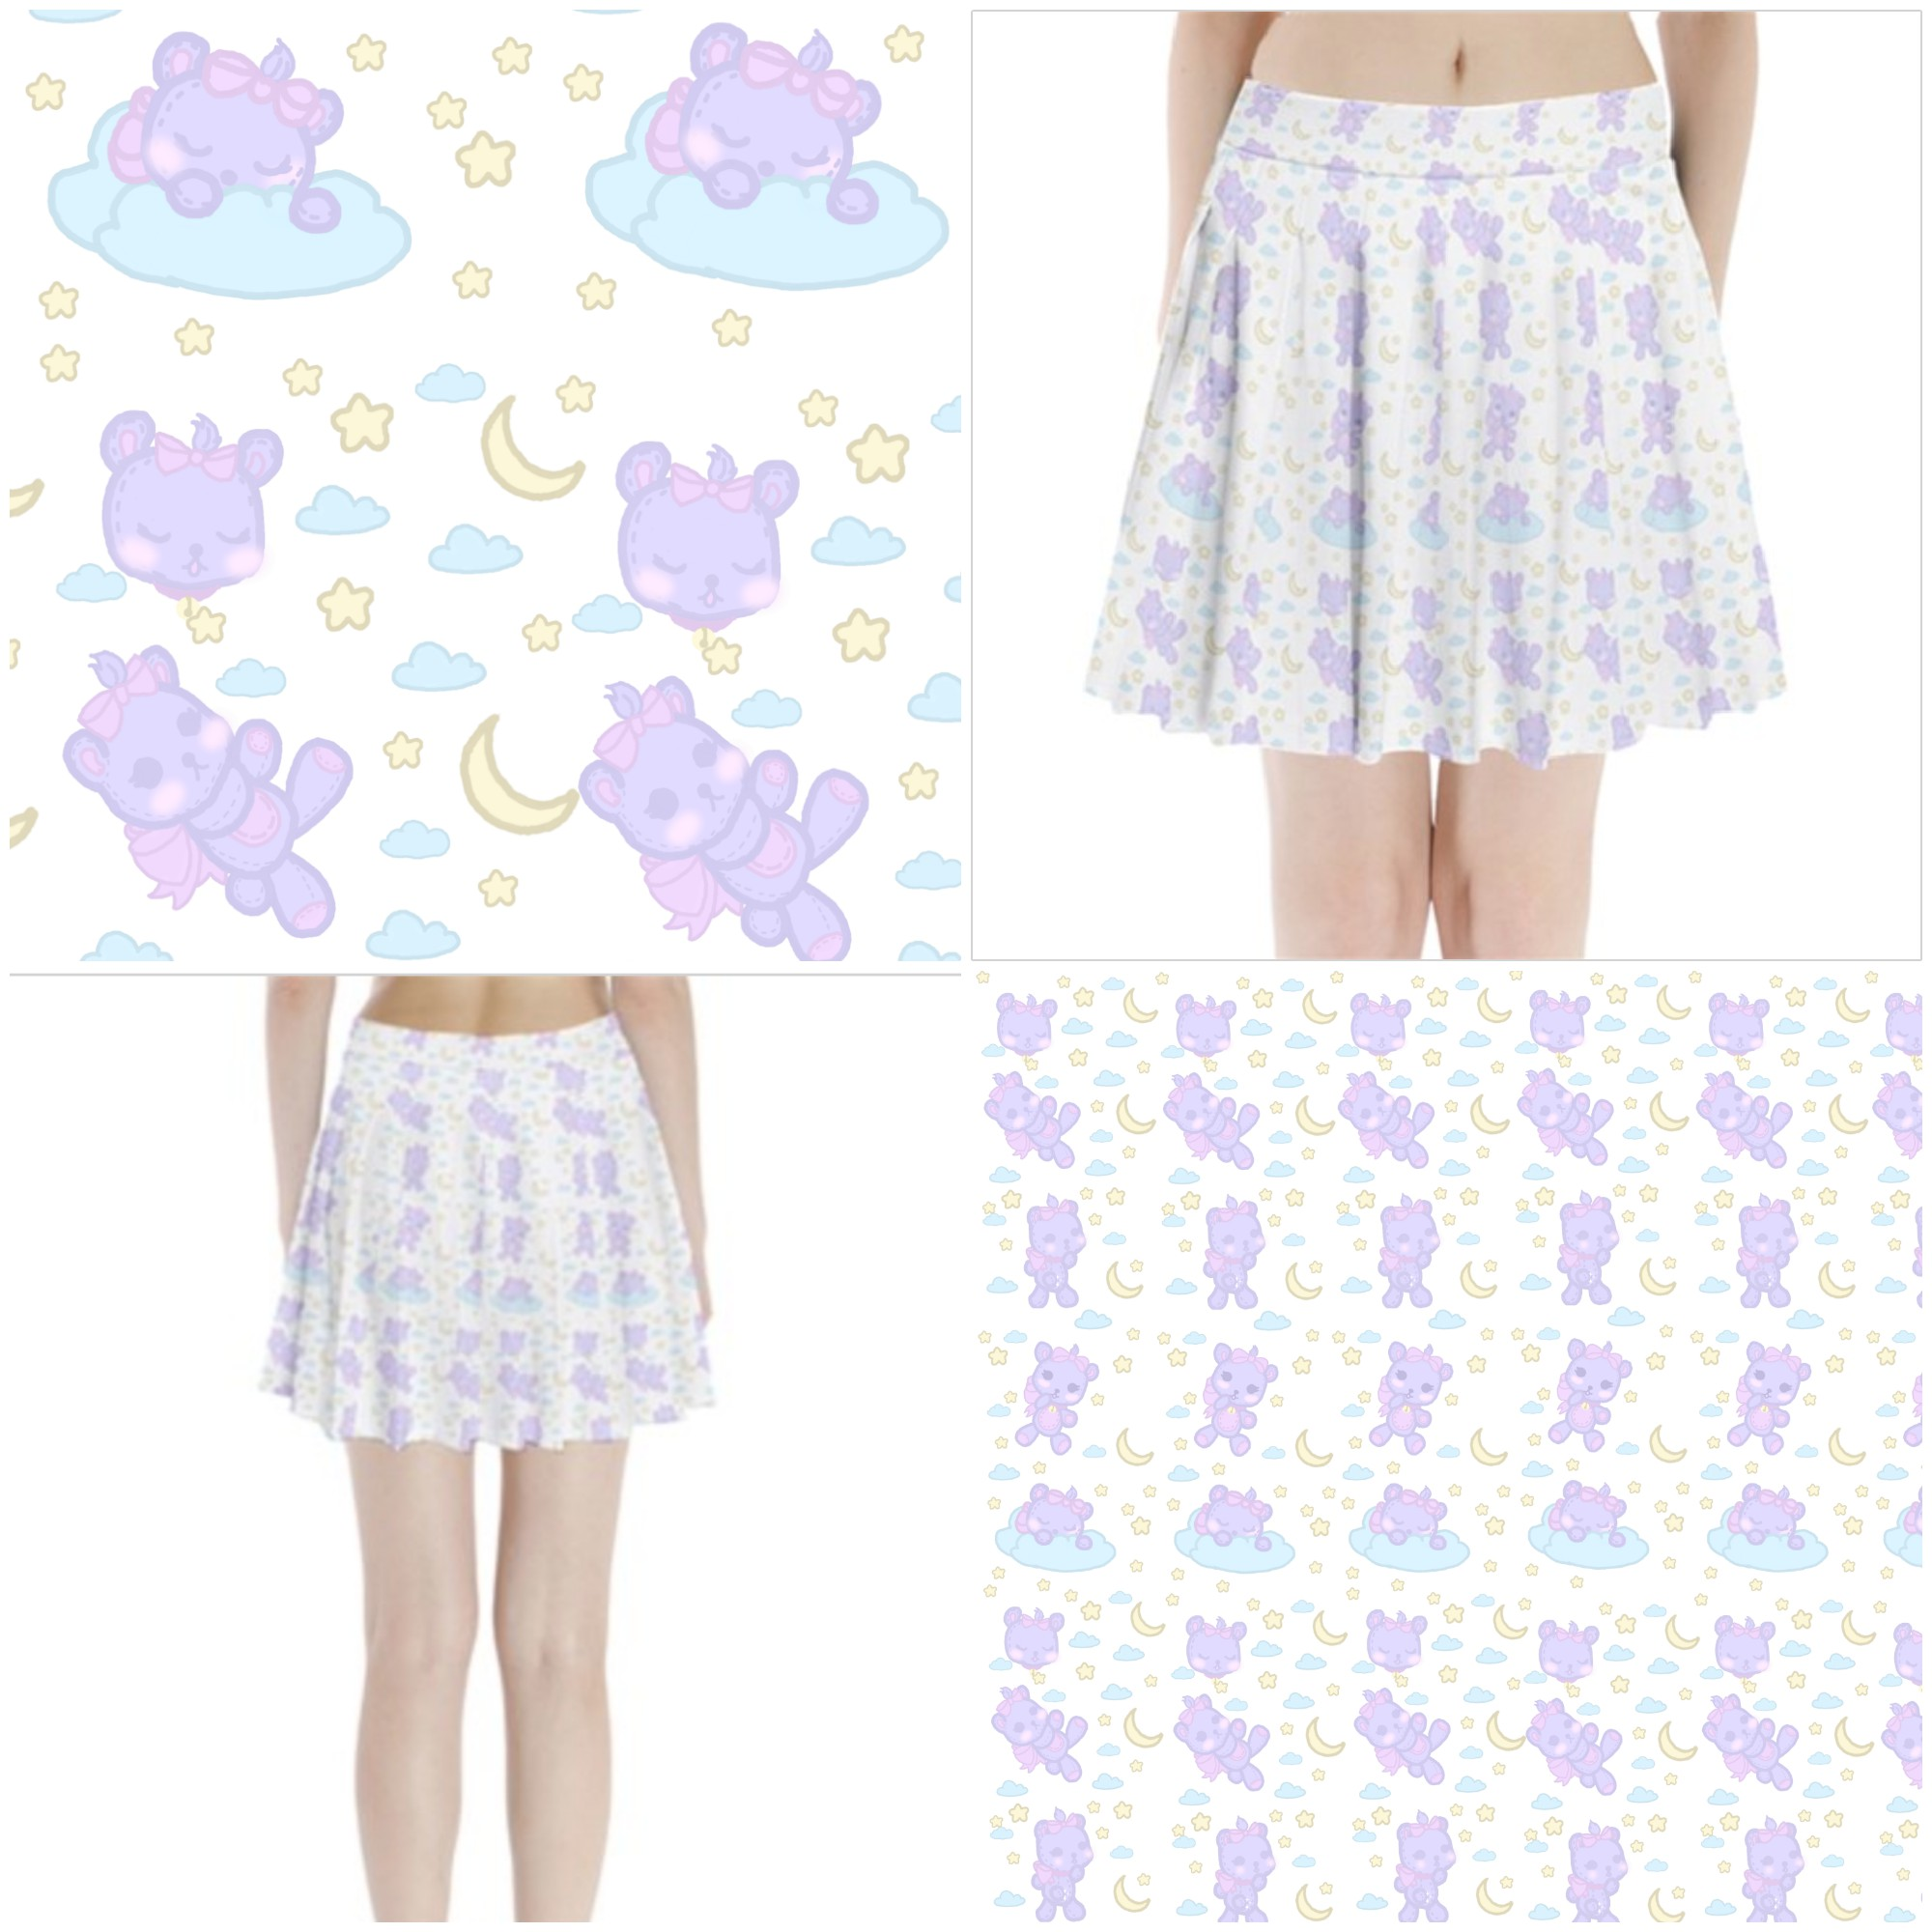 25775d34f9a Sleepy Kuma School Girl Skirt on Storenvy